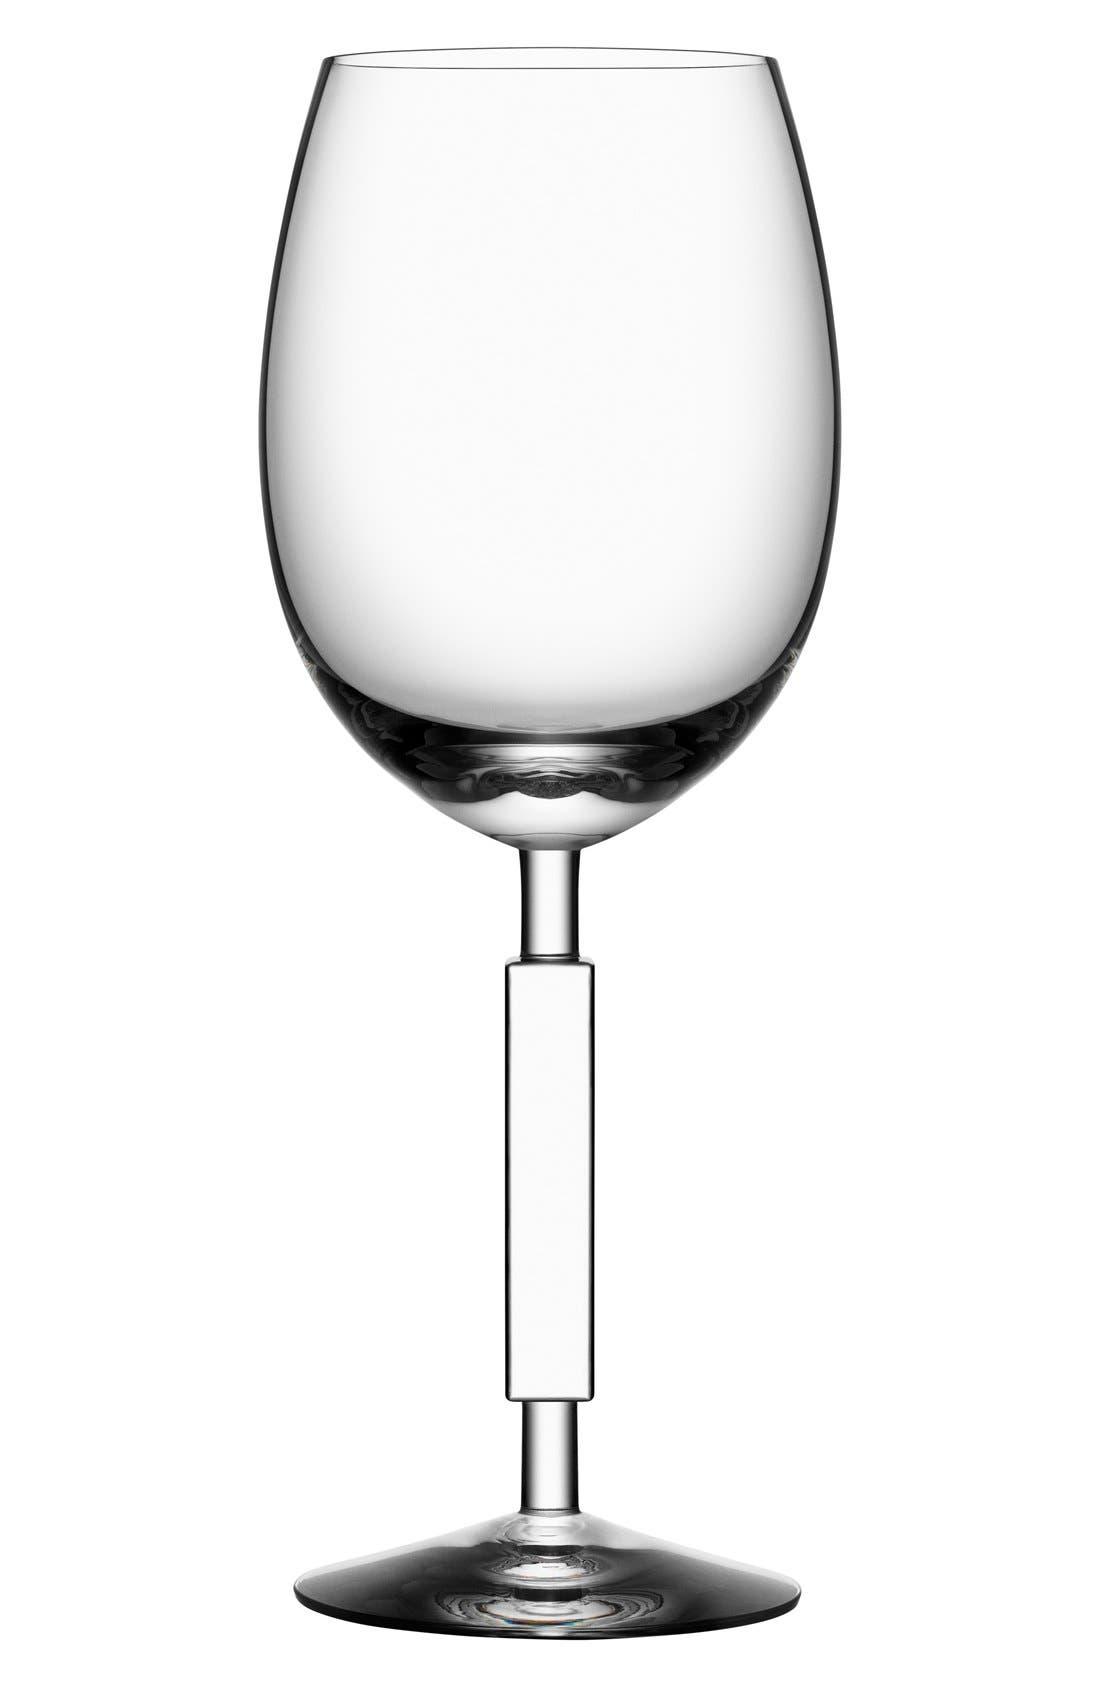 Main Image - Orrefors'Unique' WhiteWine Glass